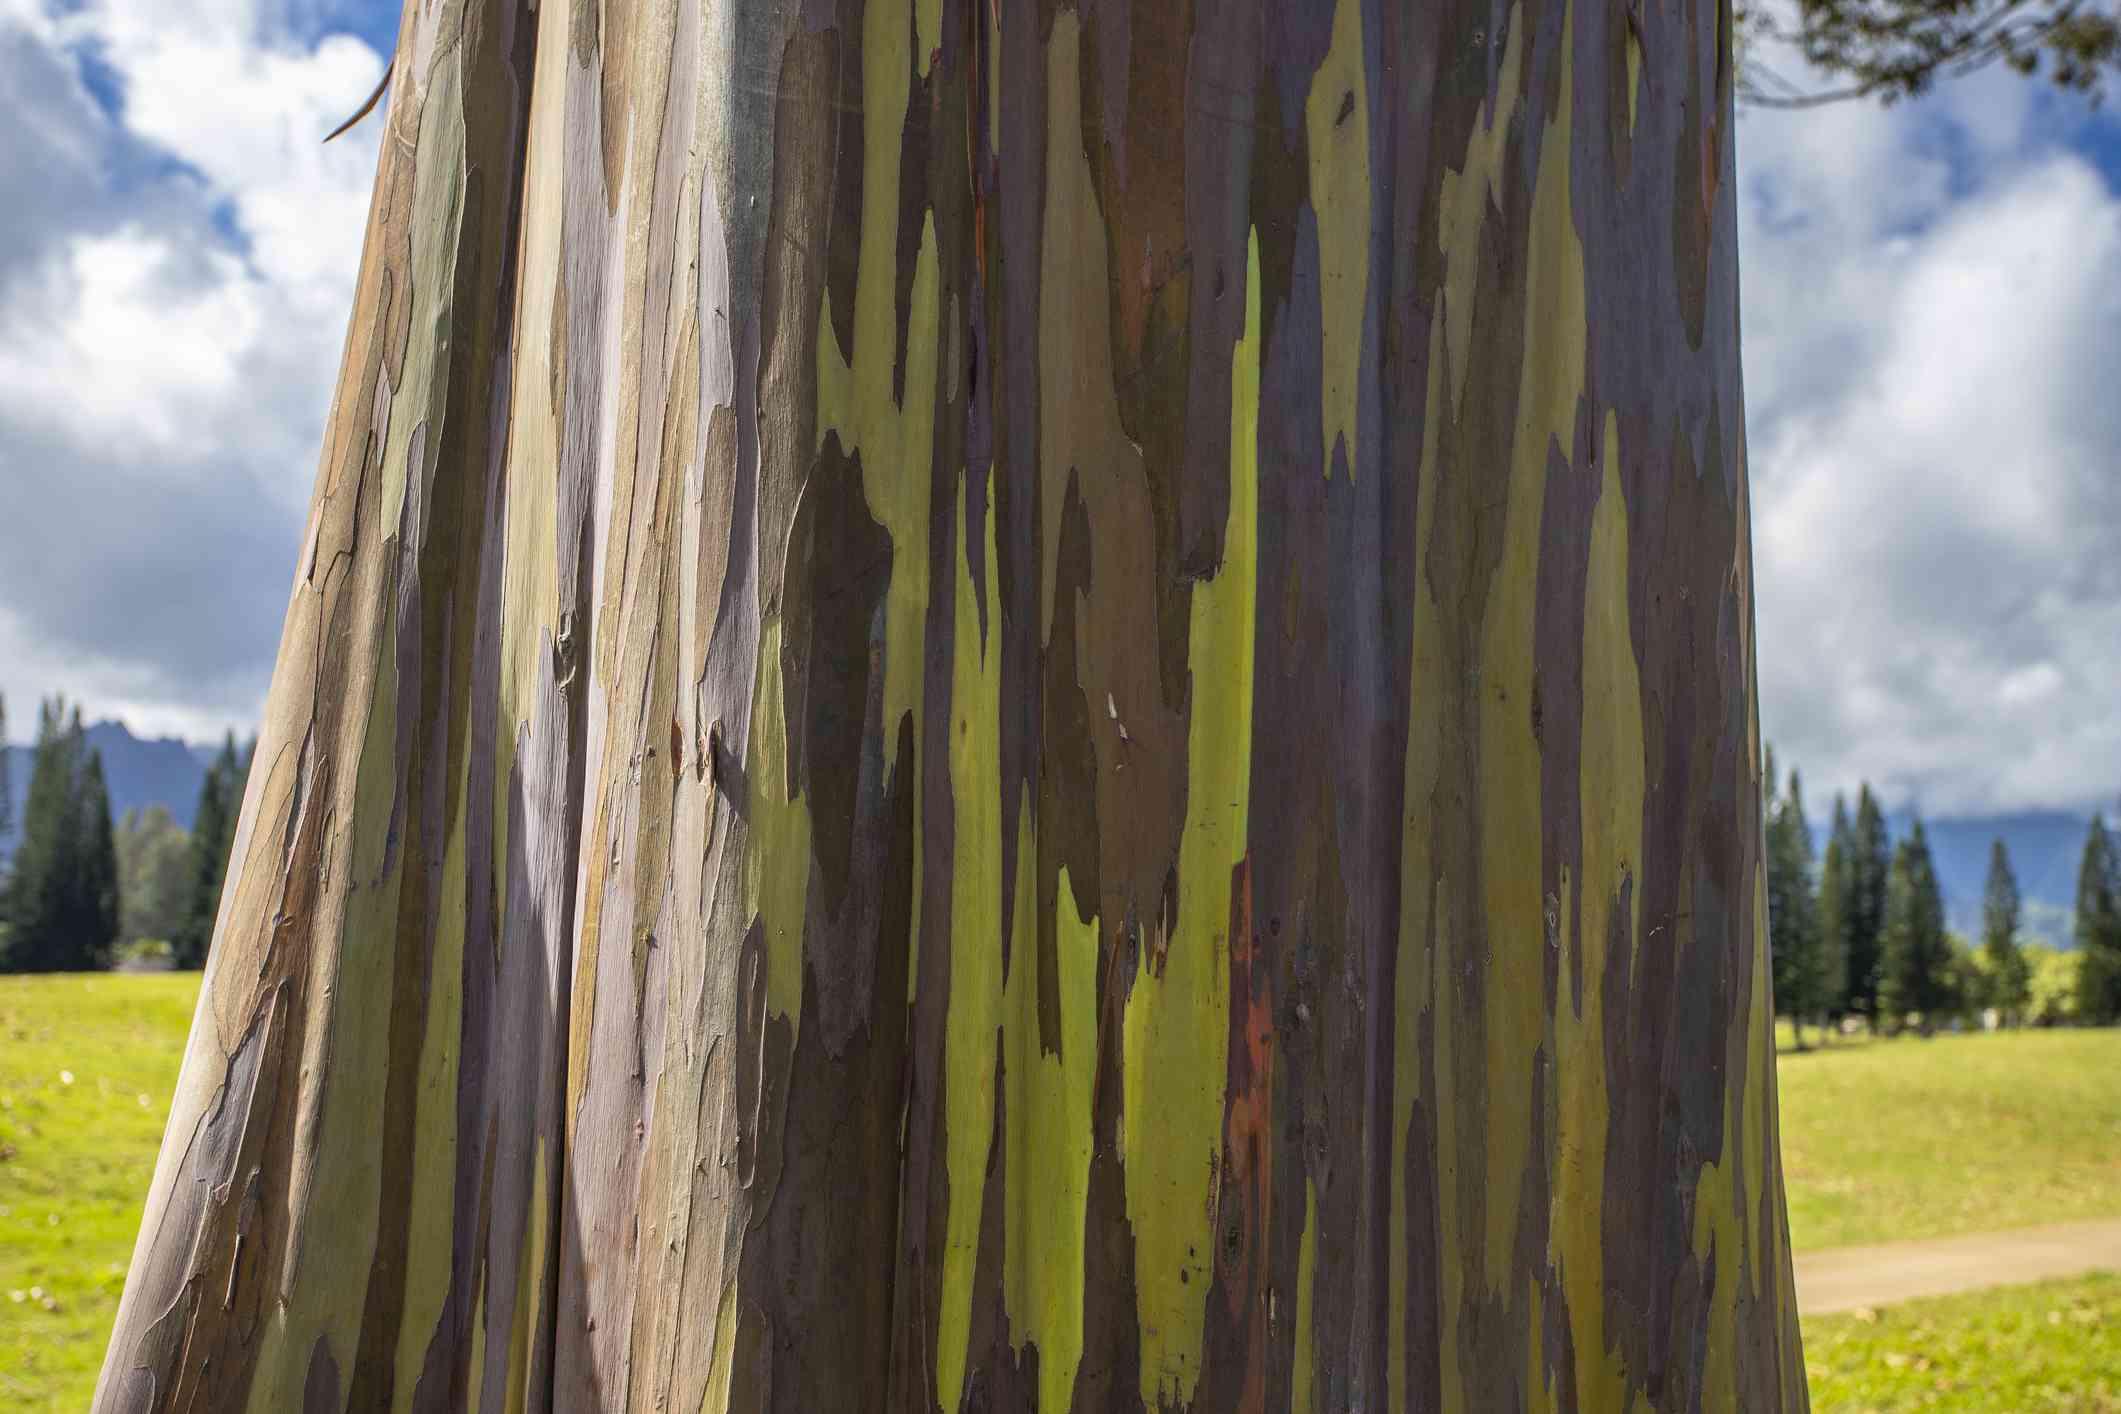 Rainbow Eucalyptus bark with golf course in background